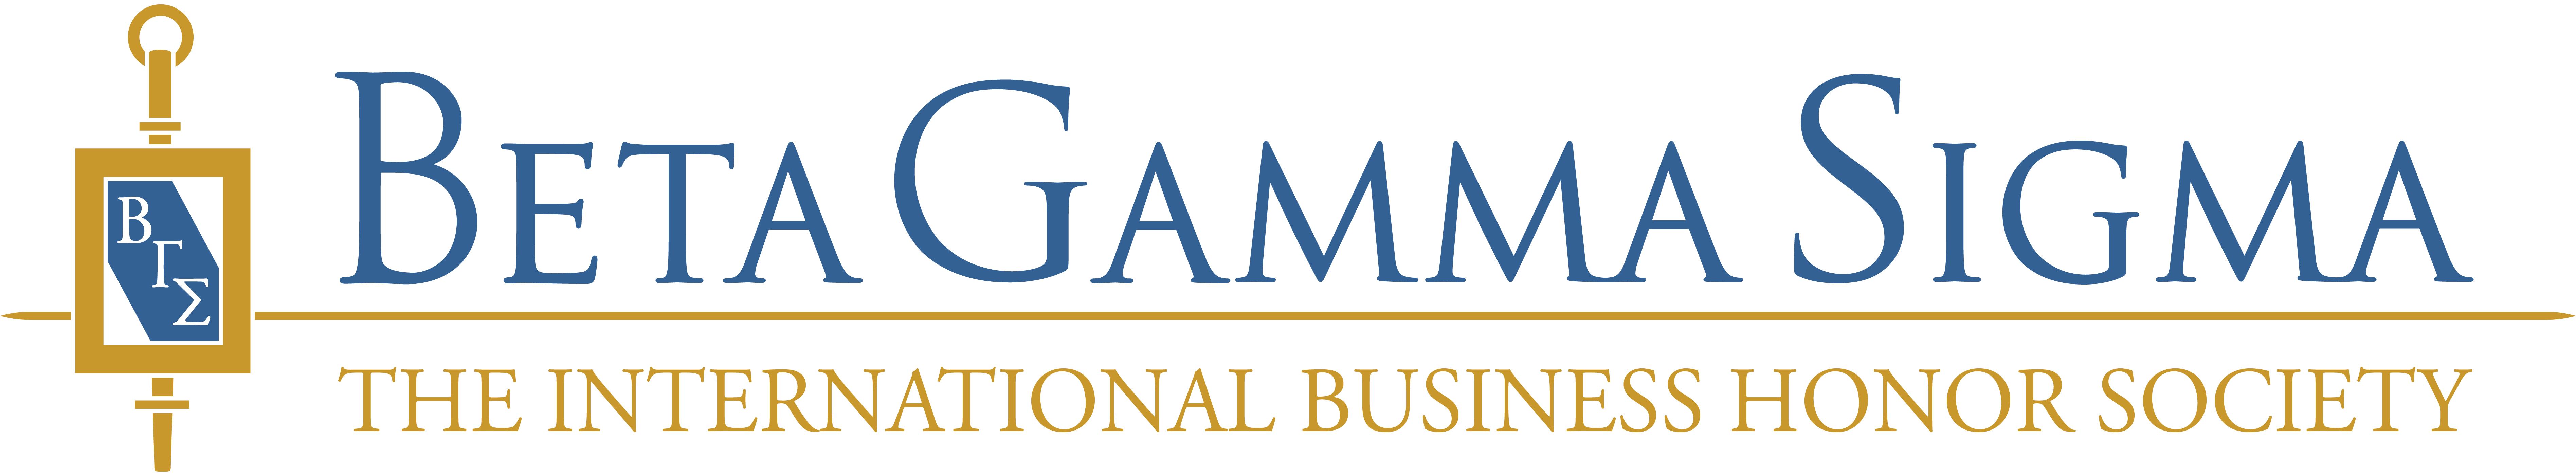 Beta Gamma Sigma The International Business Honor Society